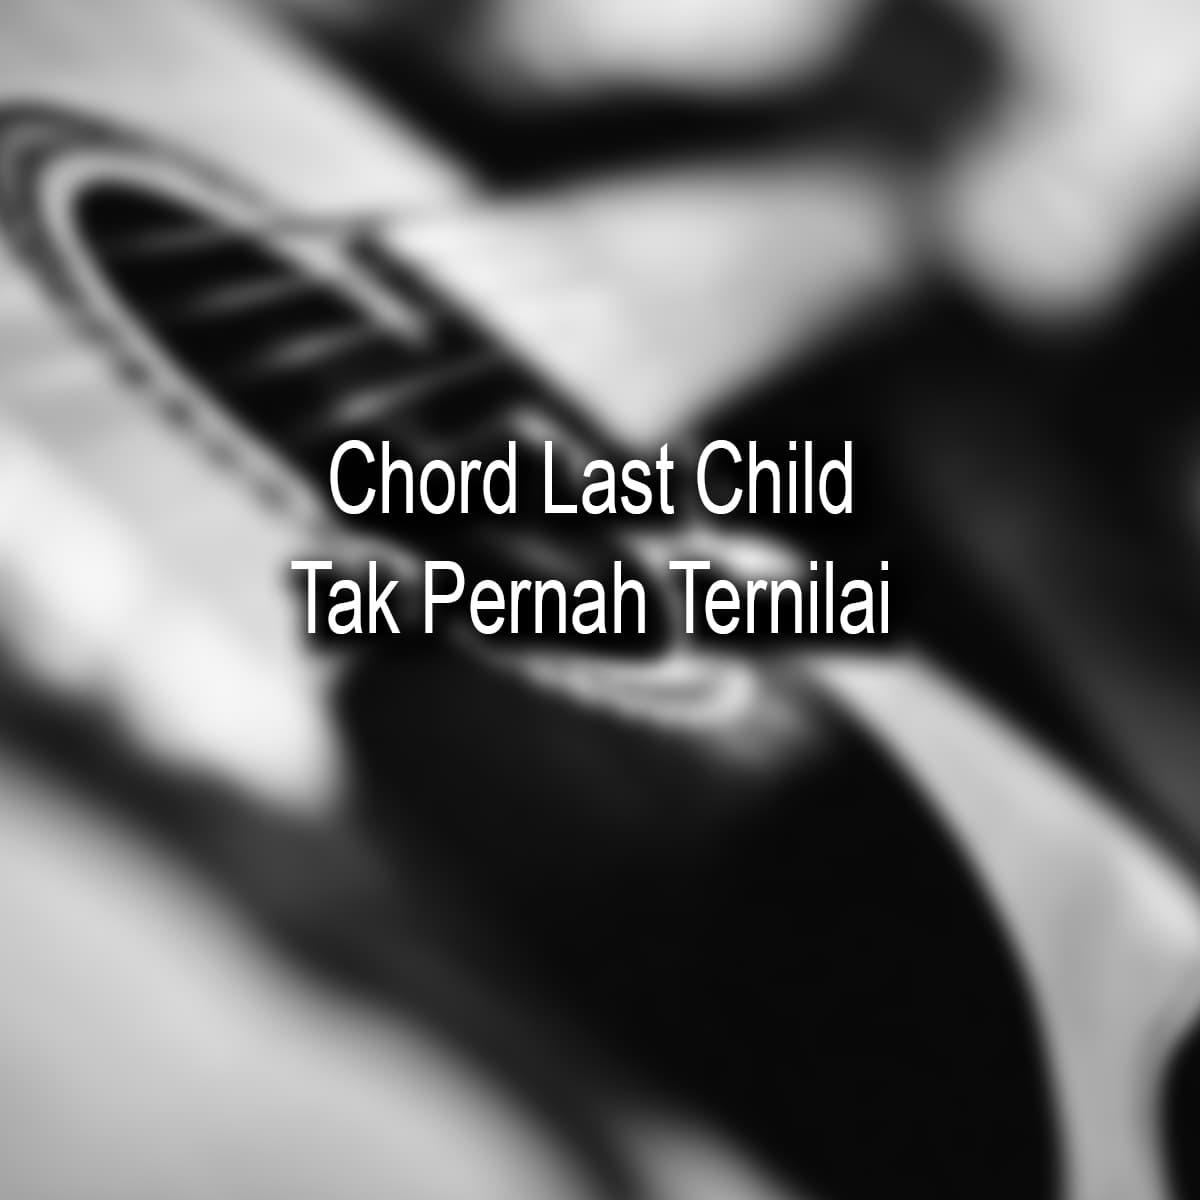 Chord Last Child Tak Pernah Ternilai